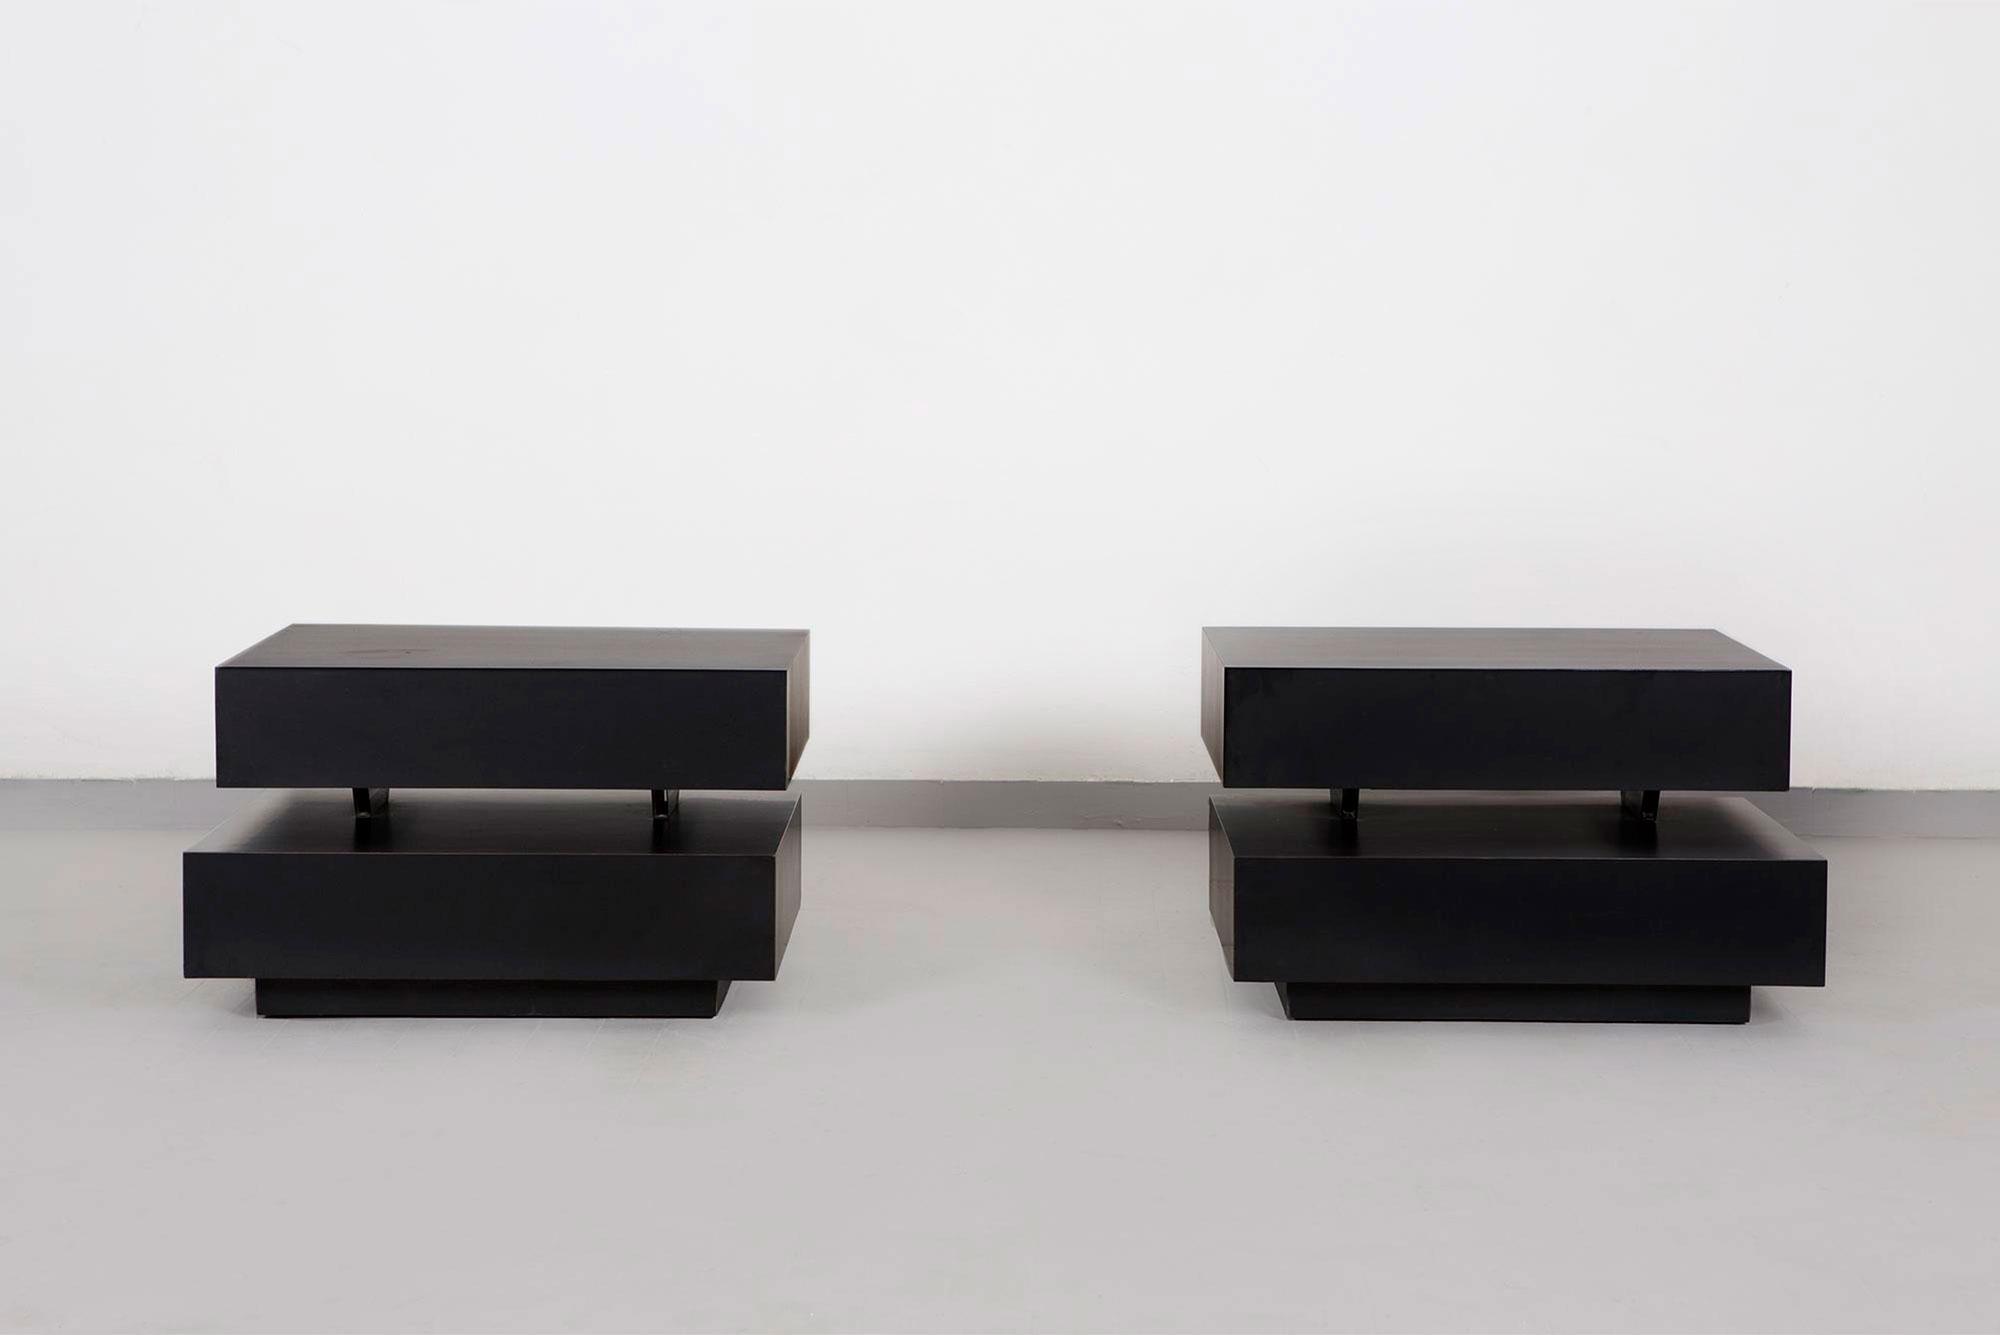 Gabriella Crespi                                 Pair of low tables